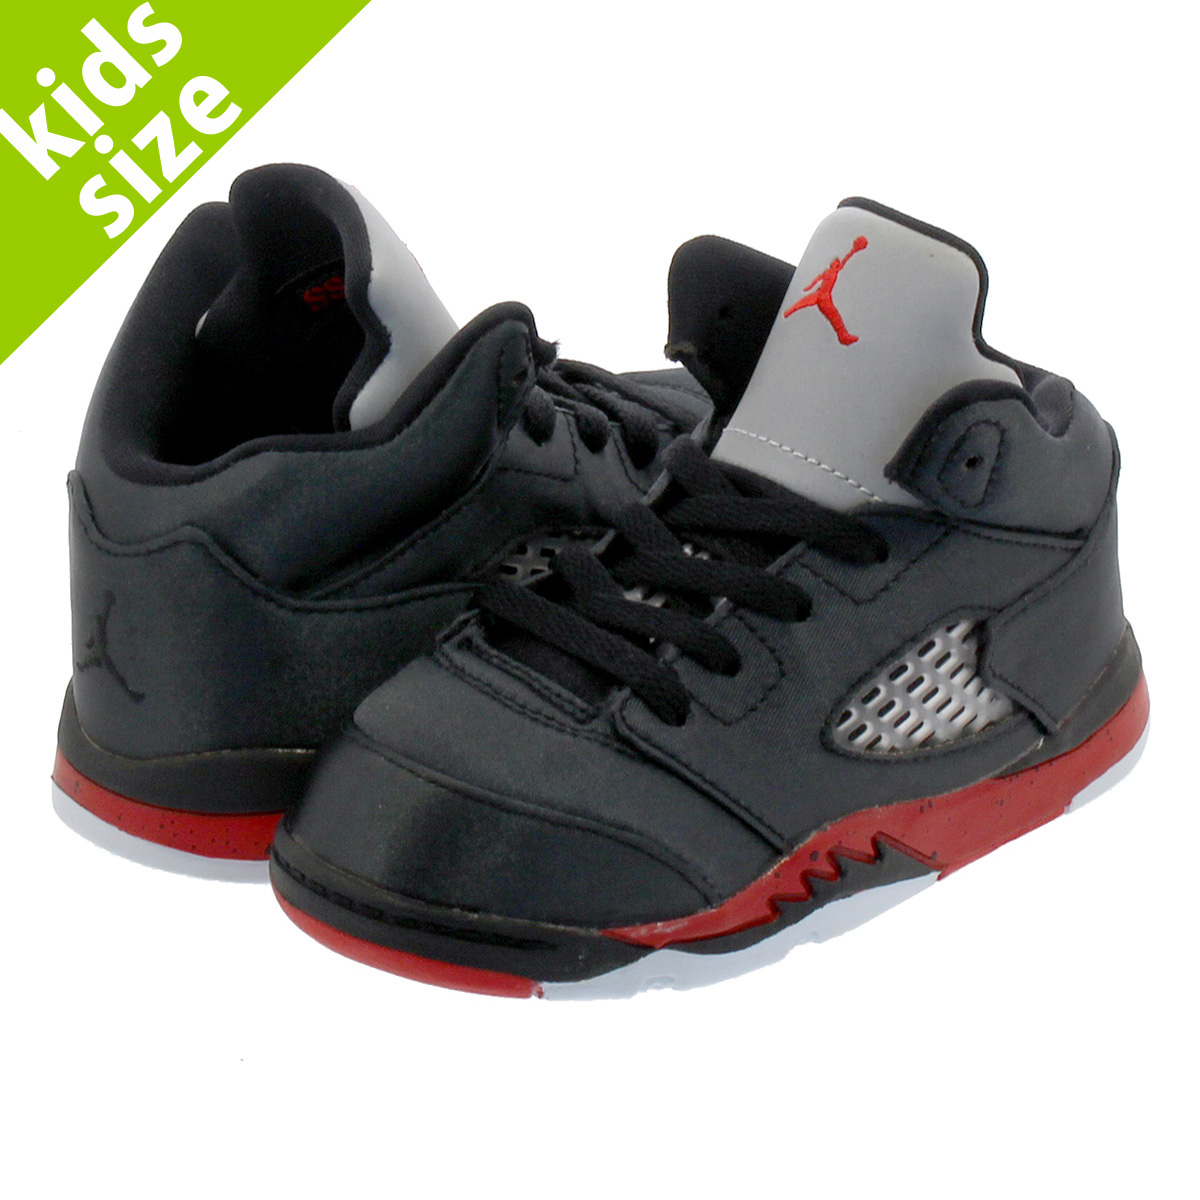 hot sale online dd9bd ab4b4 NIKE AIR JORDAN 5 RETRO BT Nike Air Jordan 5 nostalgic BT BLACK/UNIVERSITY  RED 440,890-006